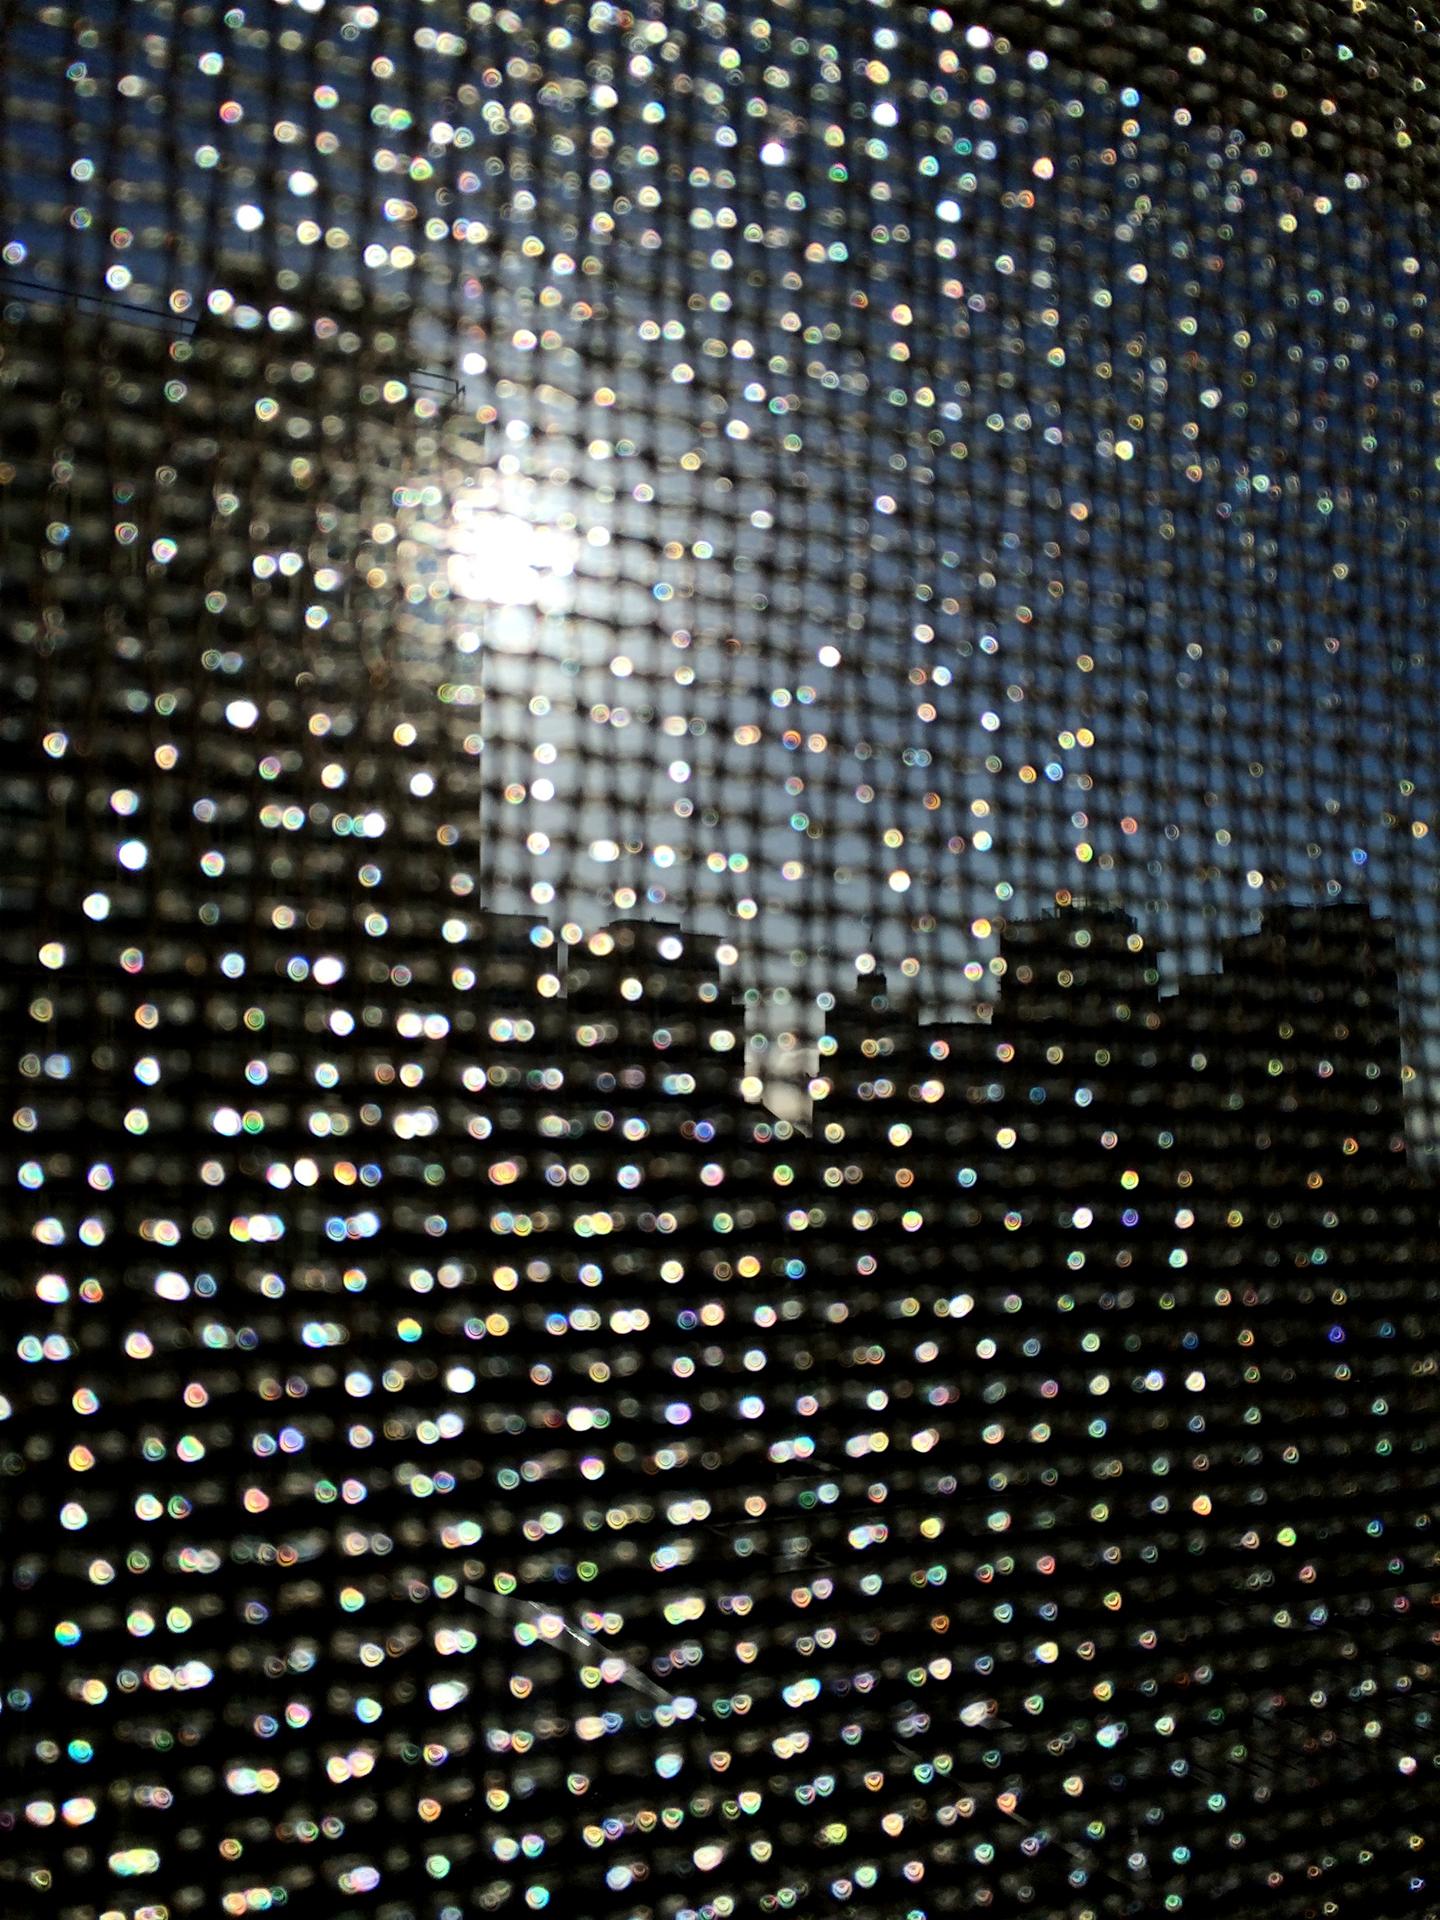 SF-HOtel-beads-window-1920.jpg